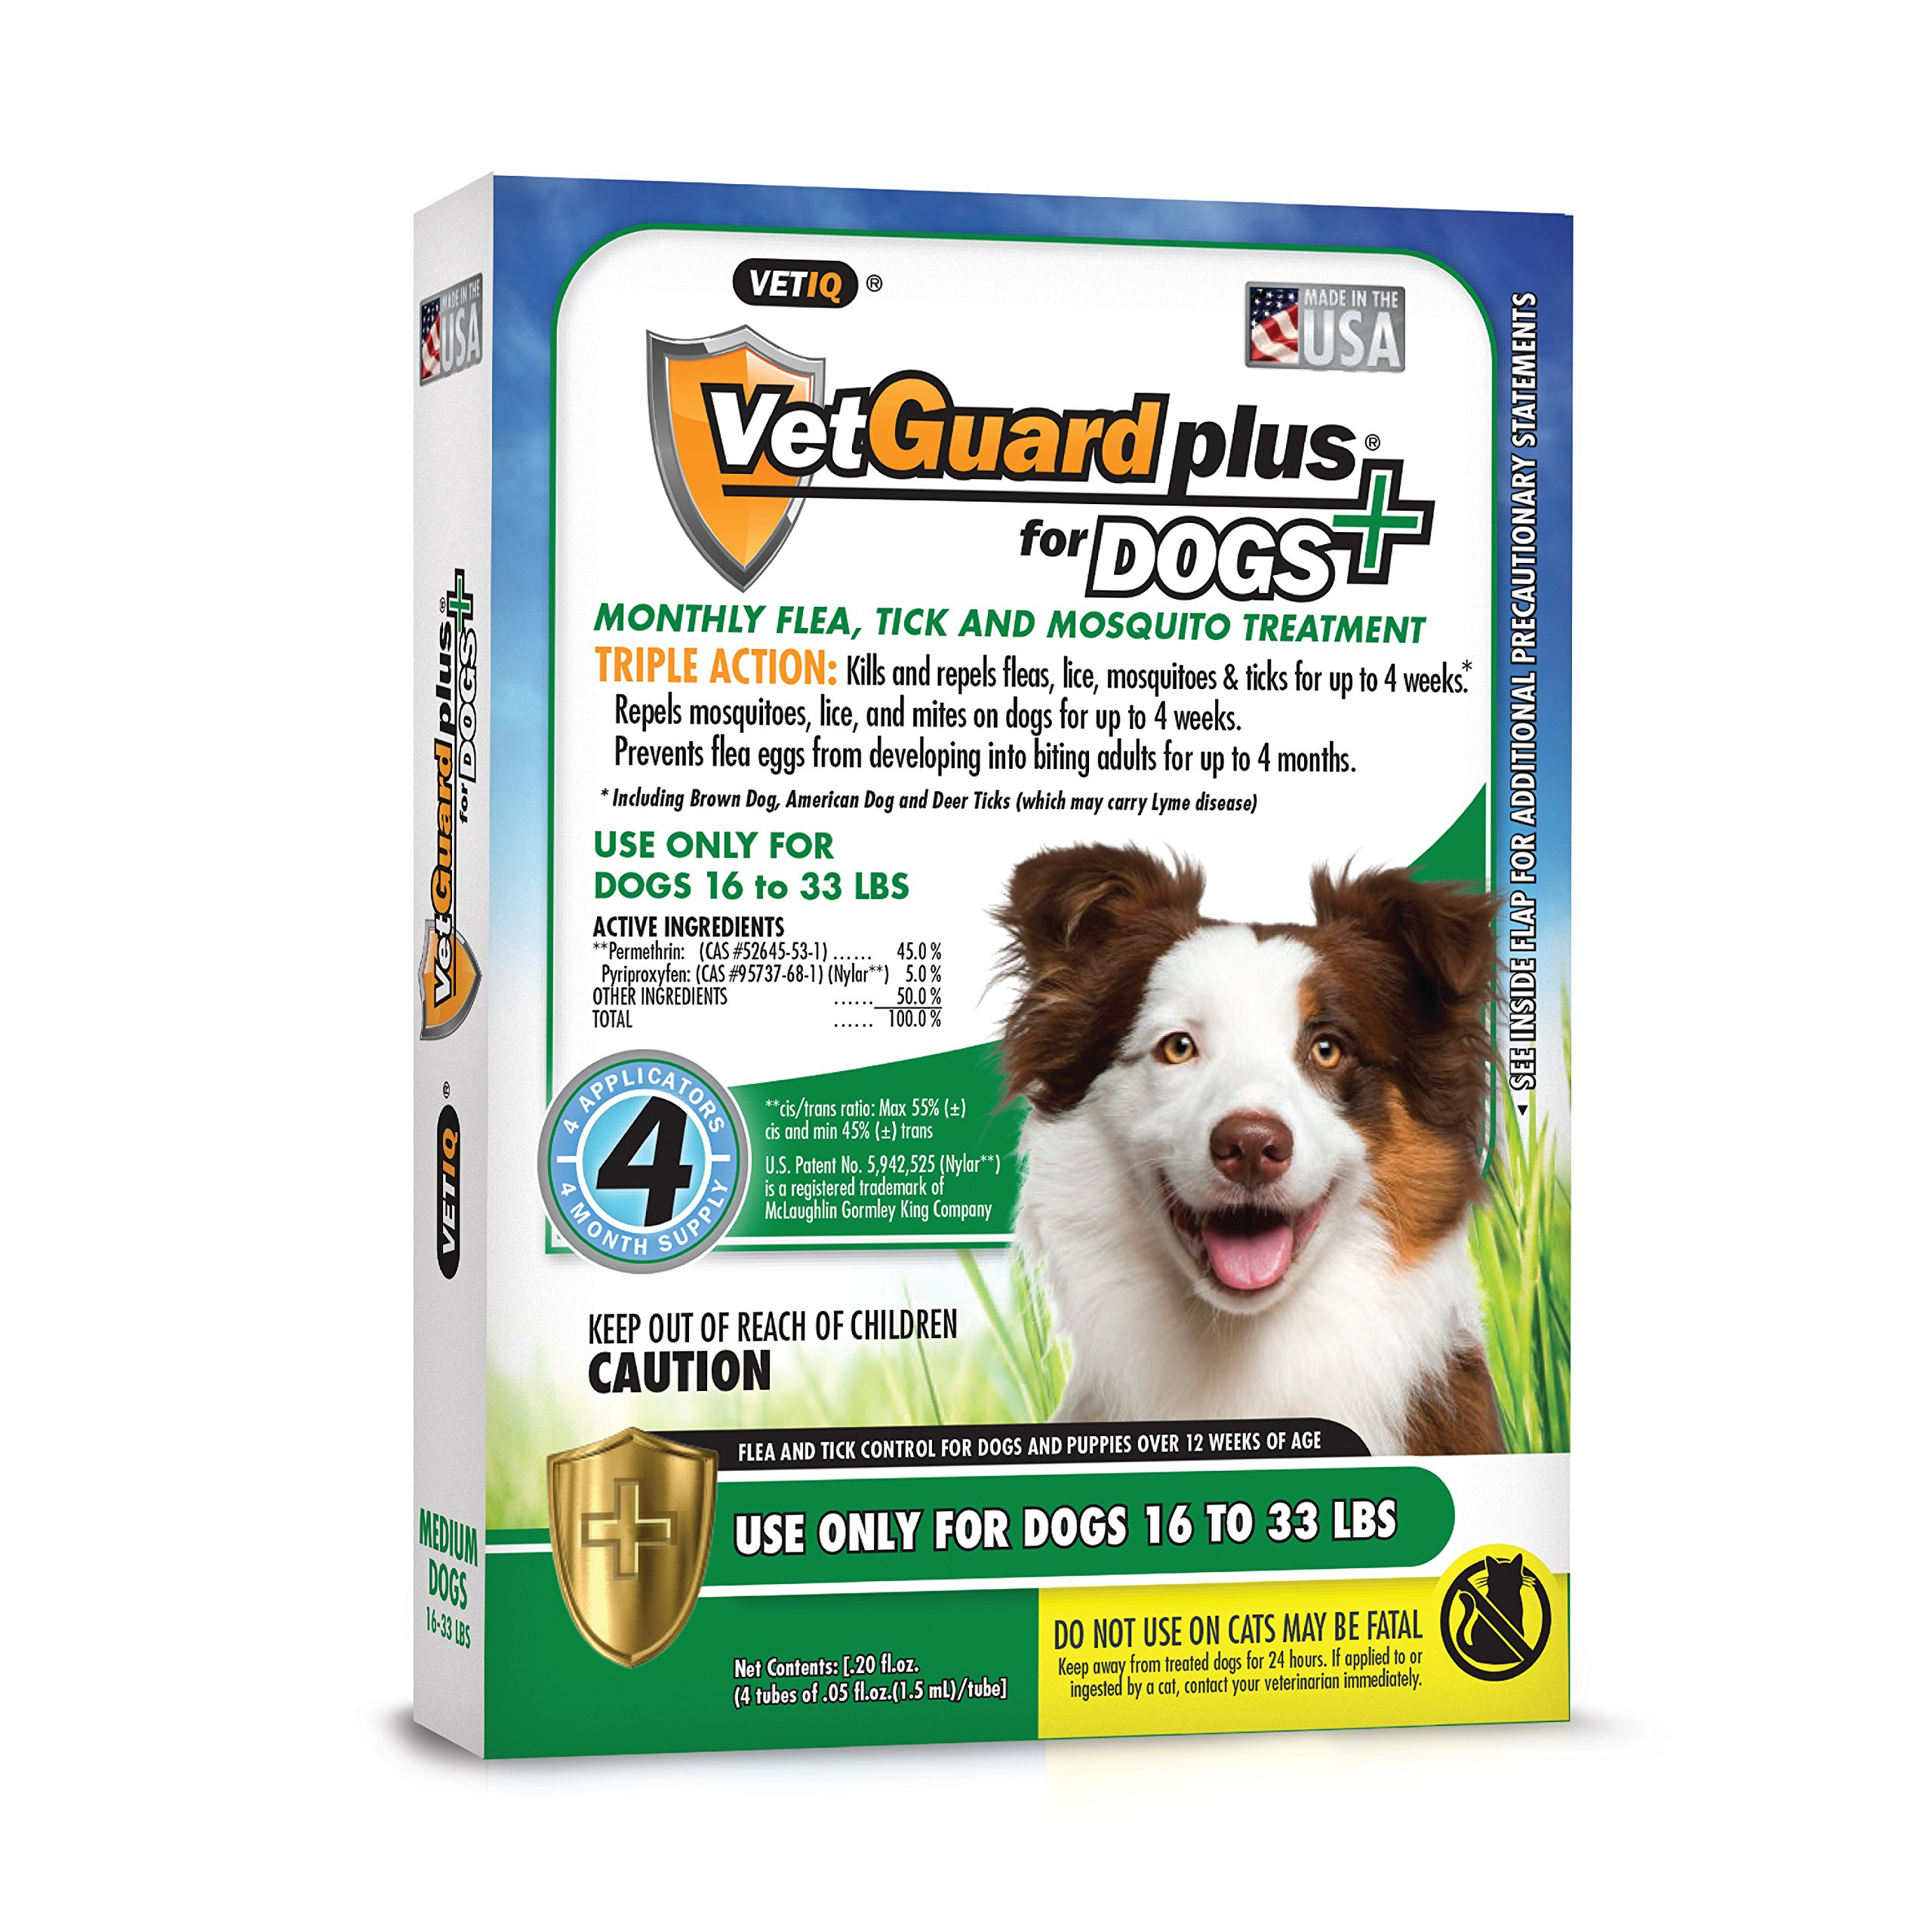 VetGuard Plus Flea & Tick Treatment for Medium Dogs, 16-33 lbs, 4 Month Supply